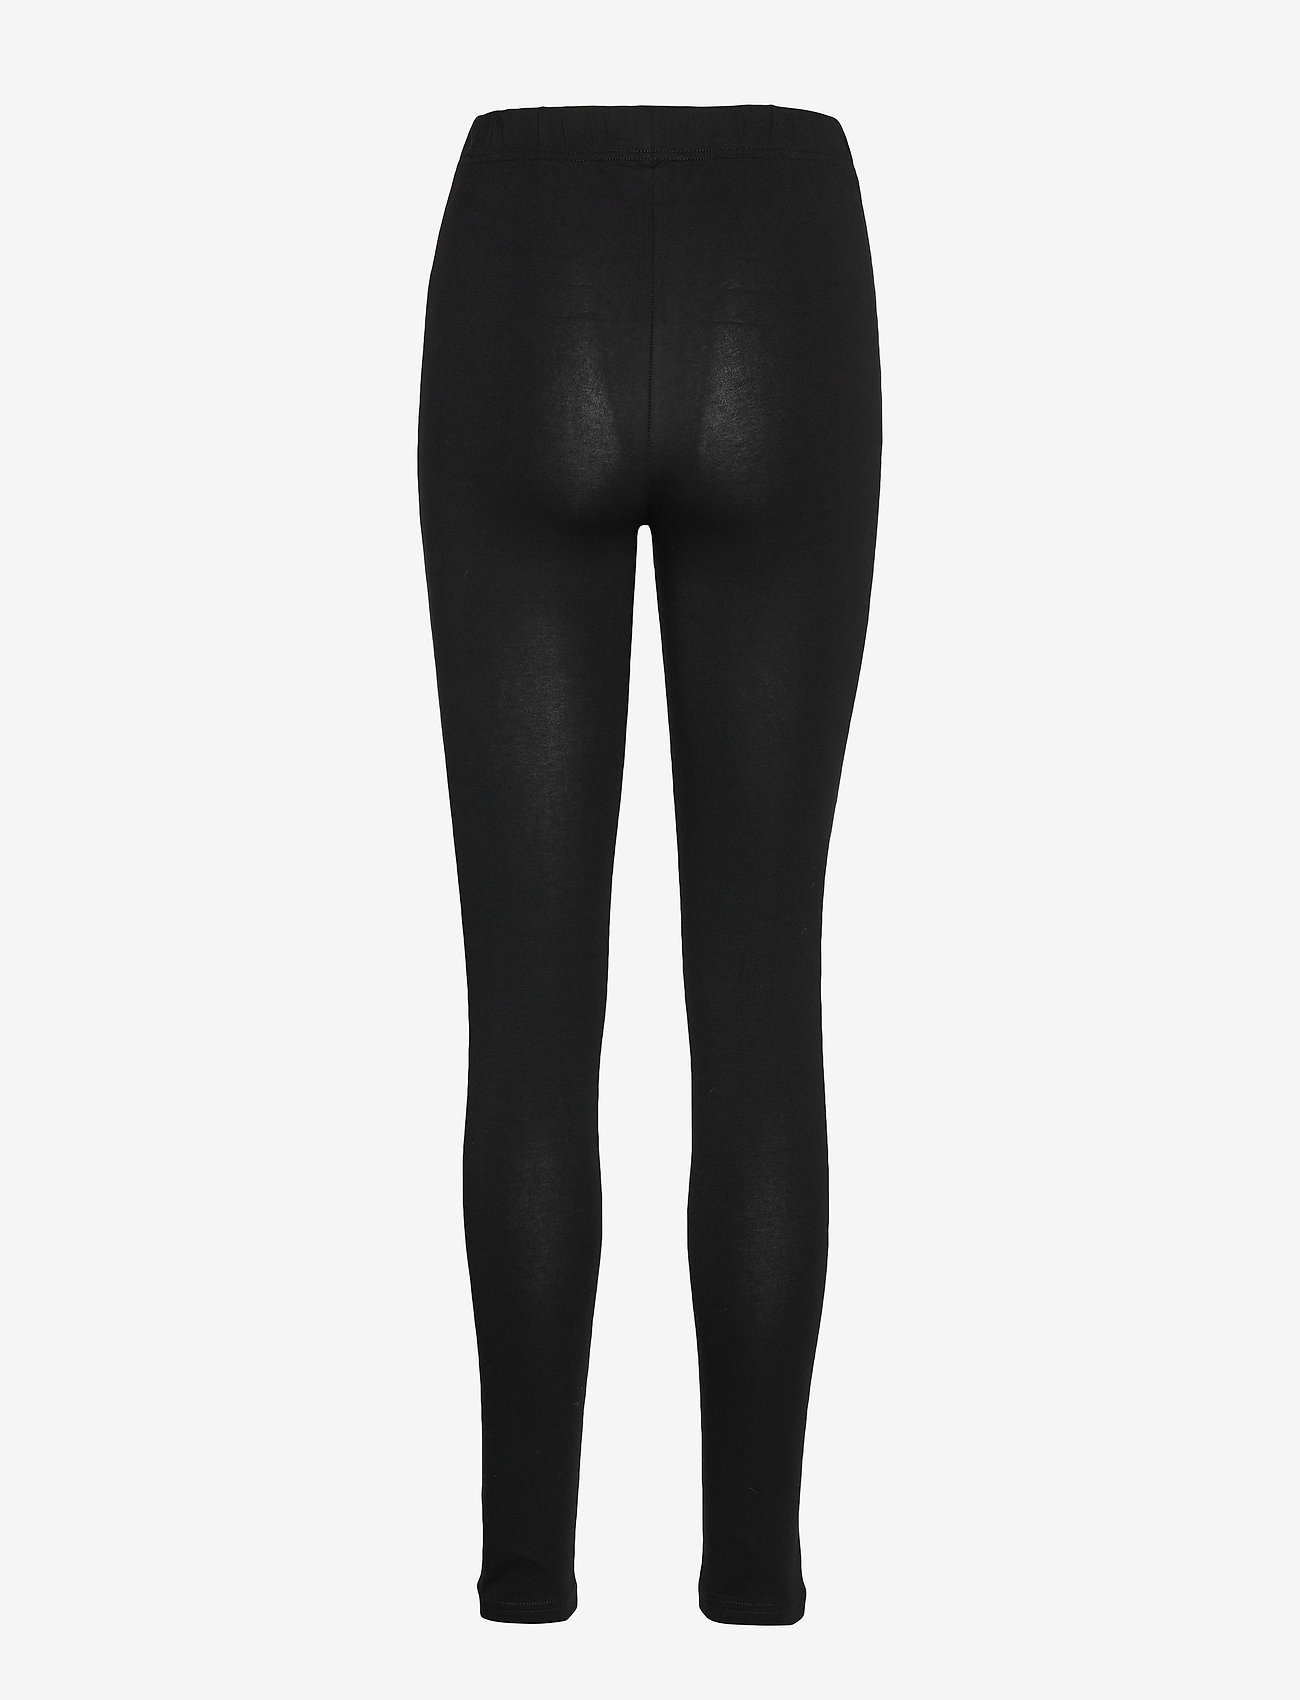 Lindex Leggings Vigor- Leggings & collants gnIpLIcu BSV5A Cf0VwNB4